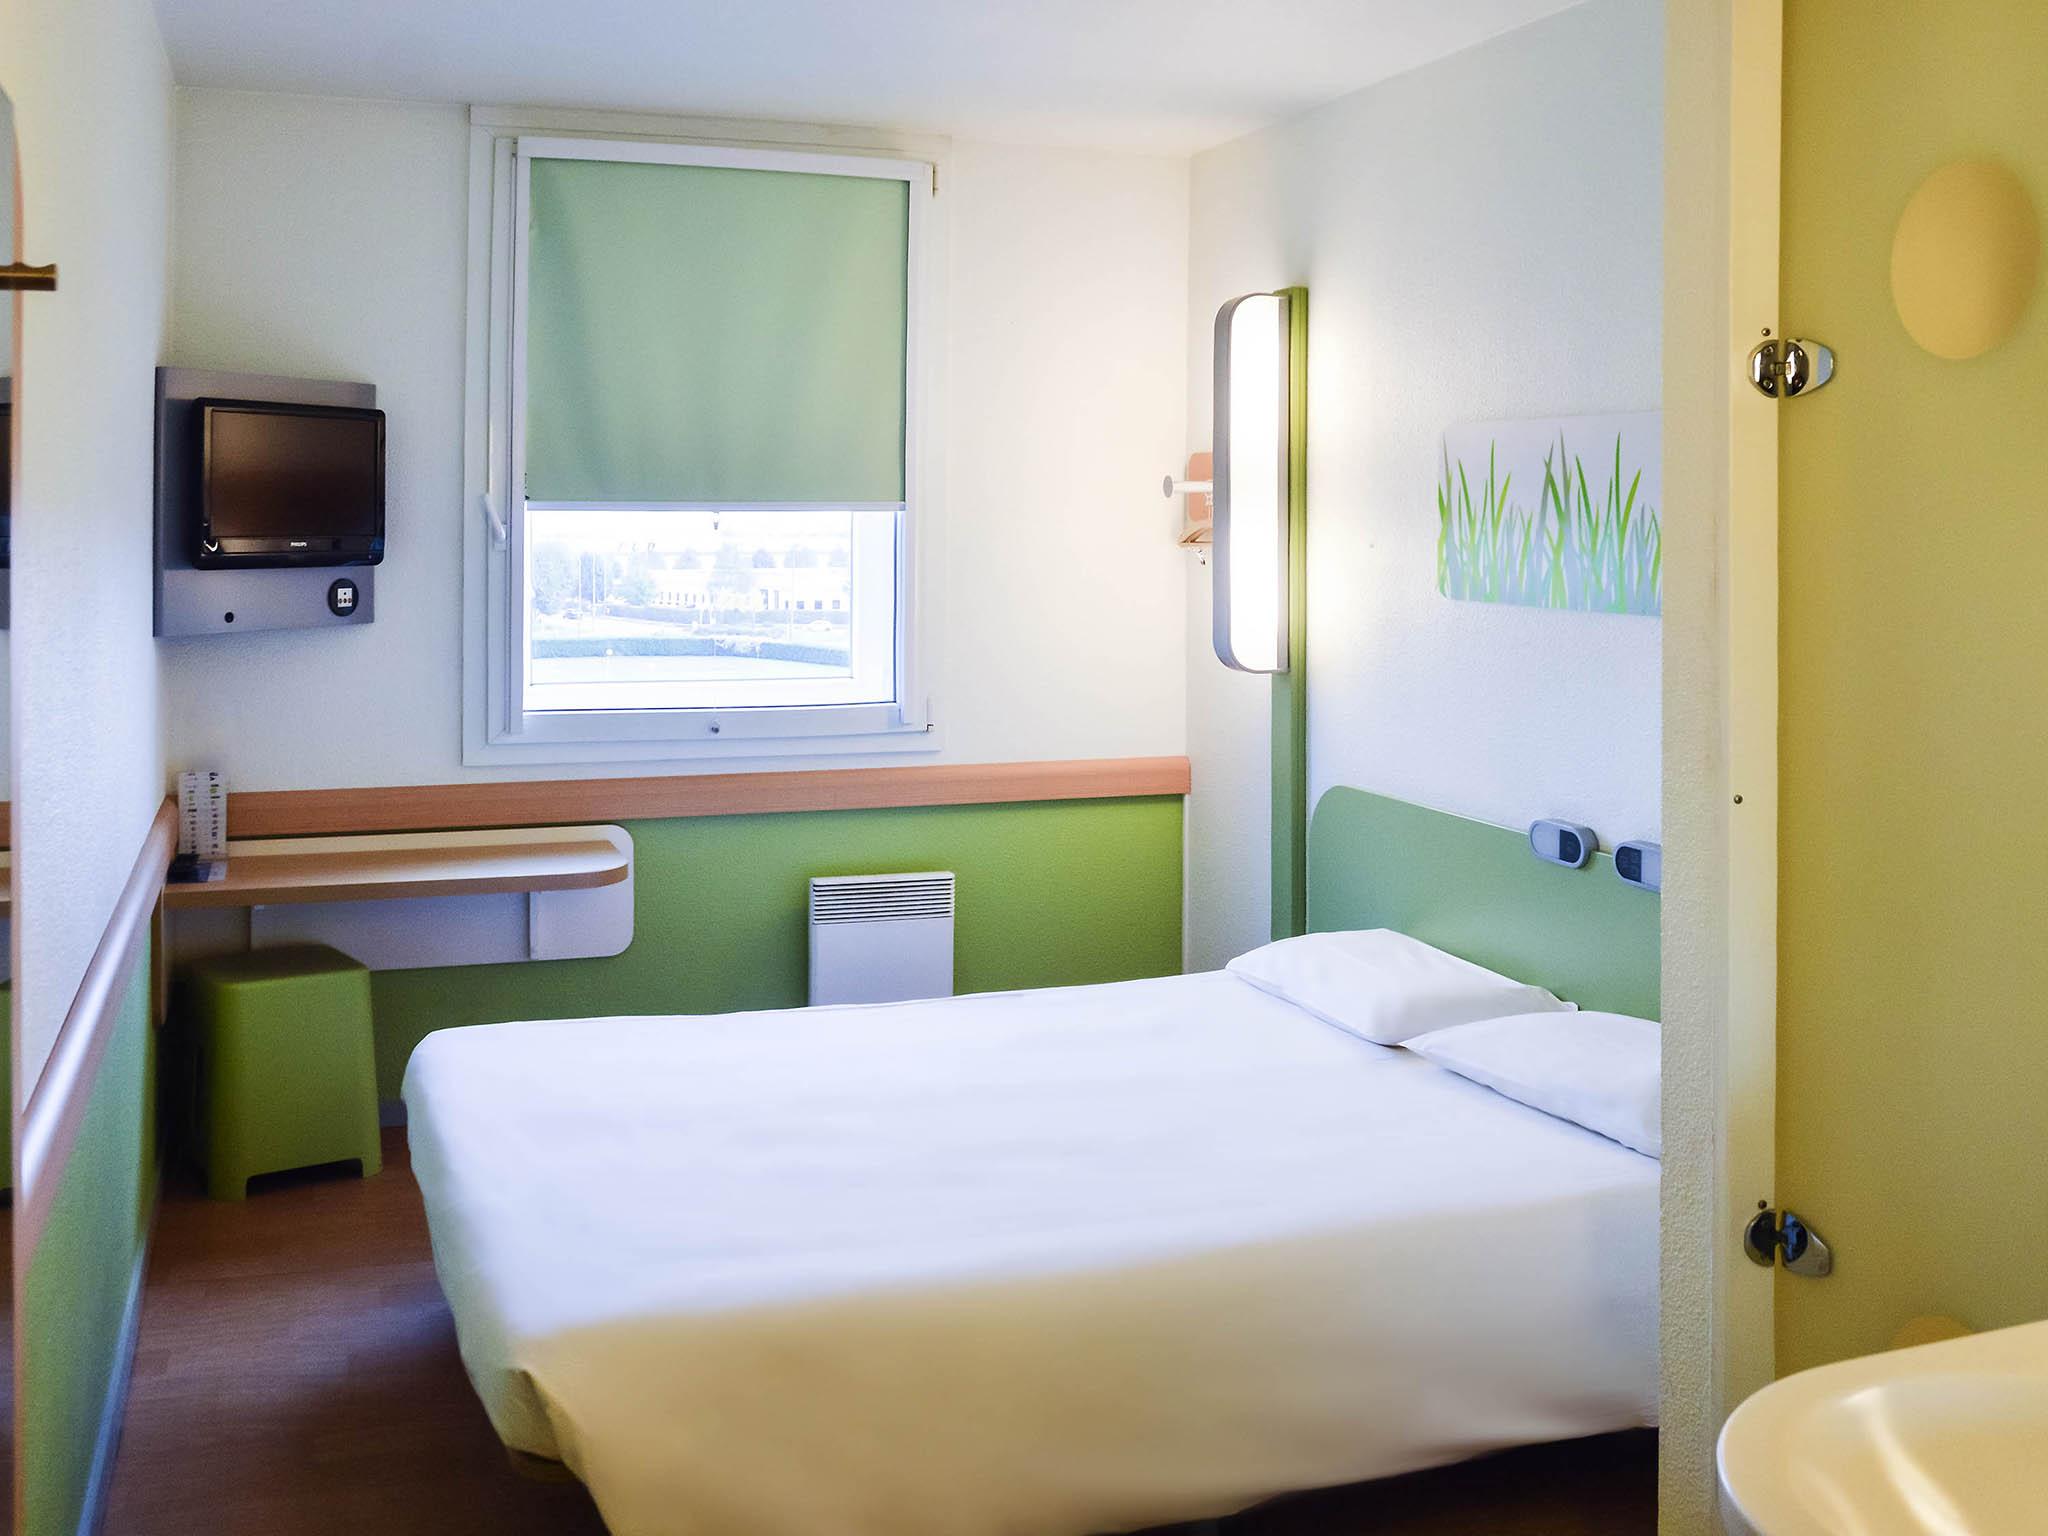 Hotel in ROISSY CHARLES DE GAULLE - ibis budget Roissy CDG ... - photo#16